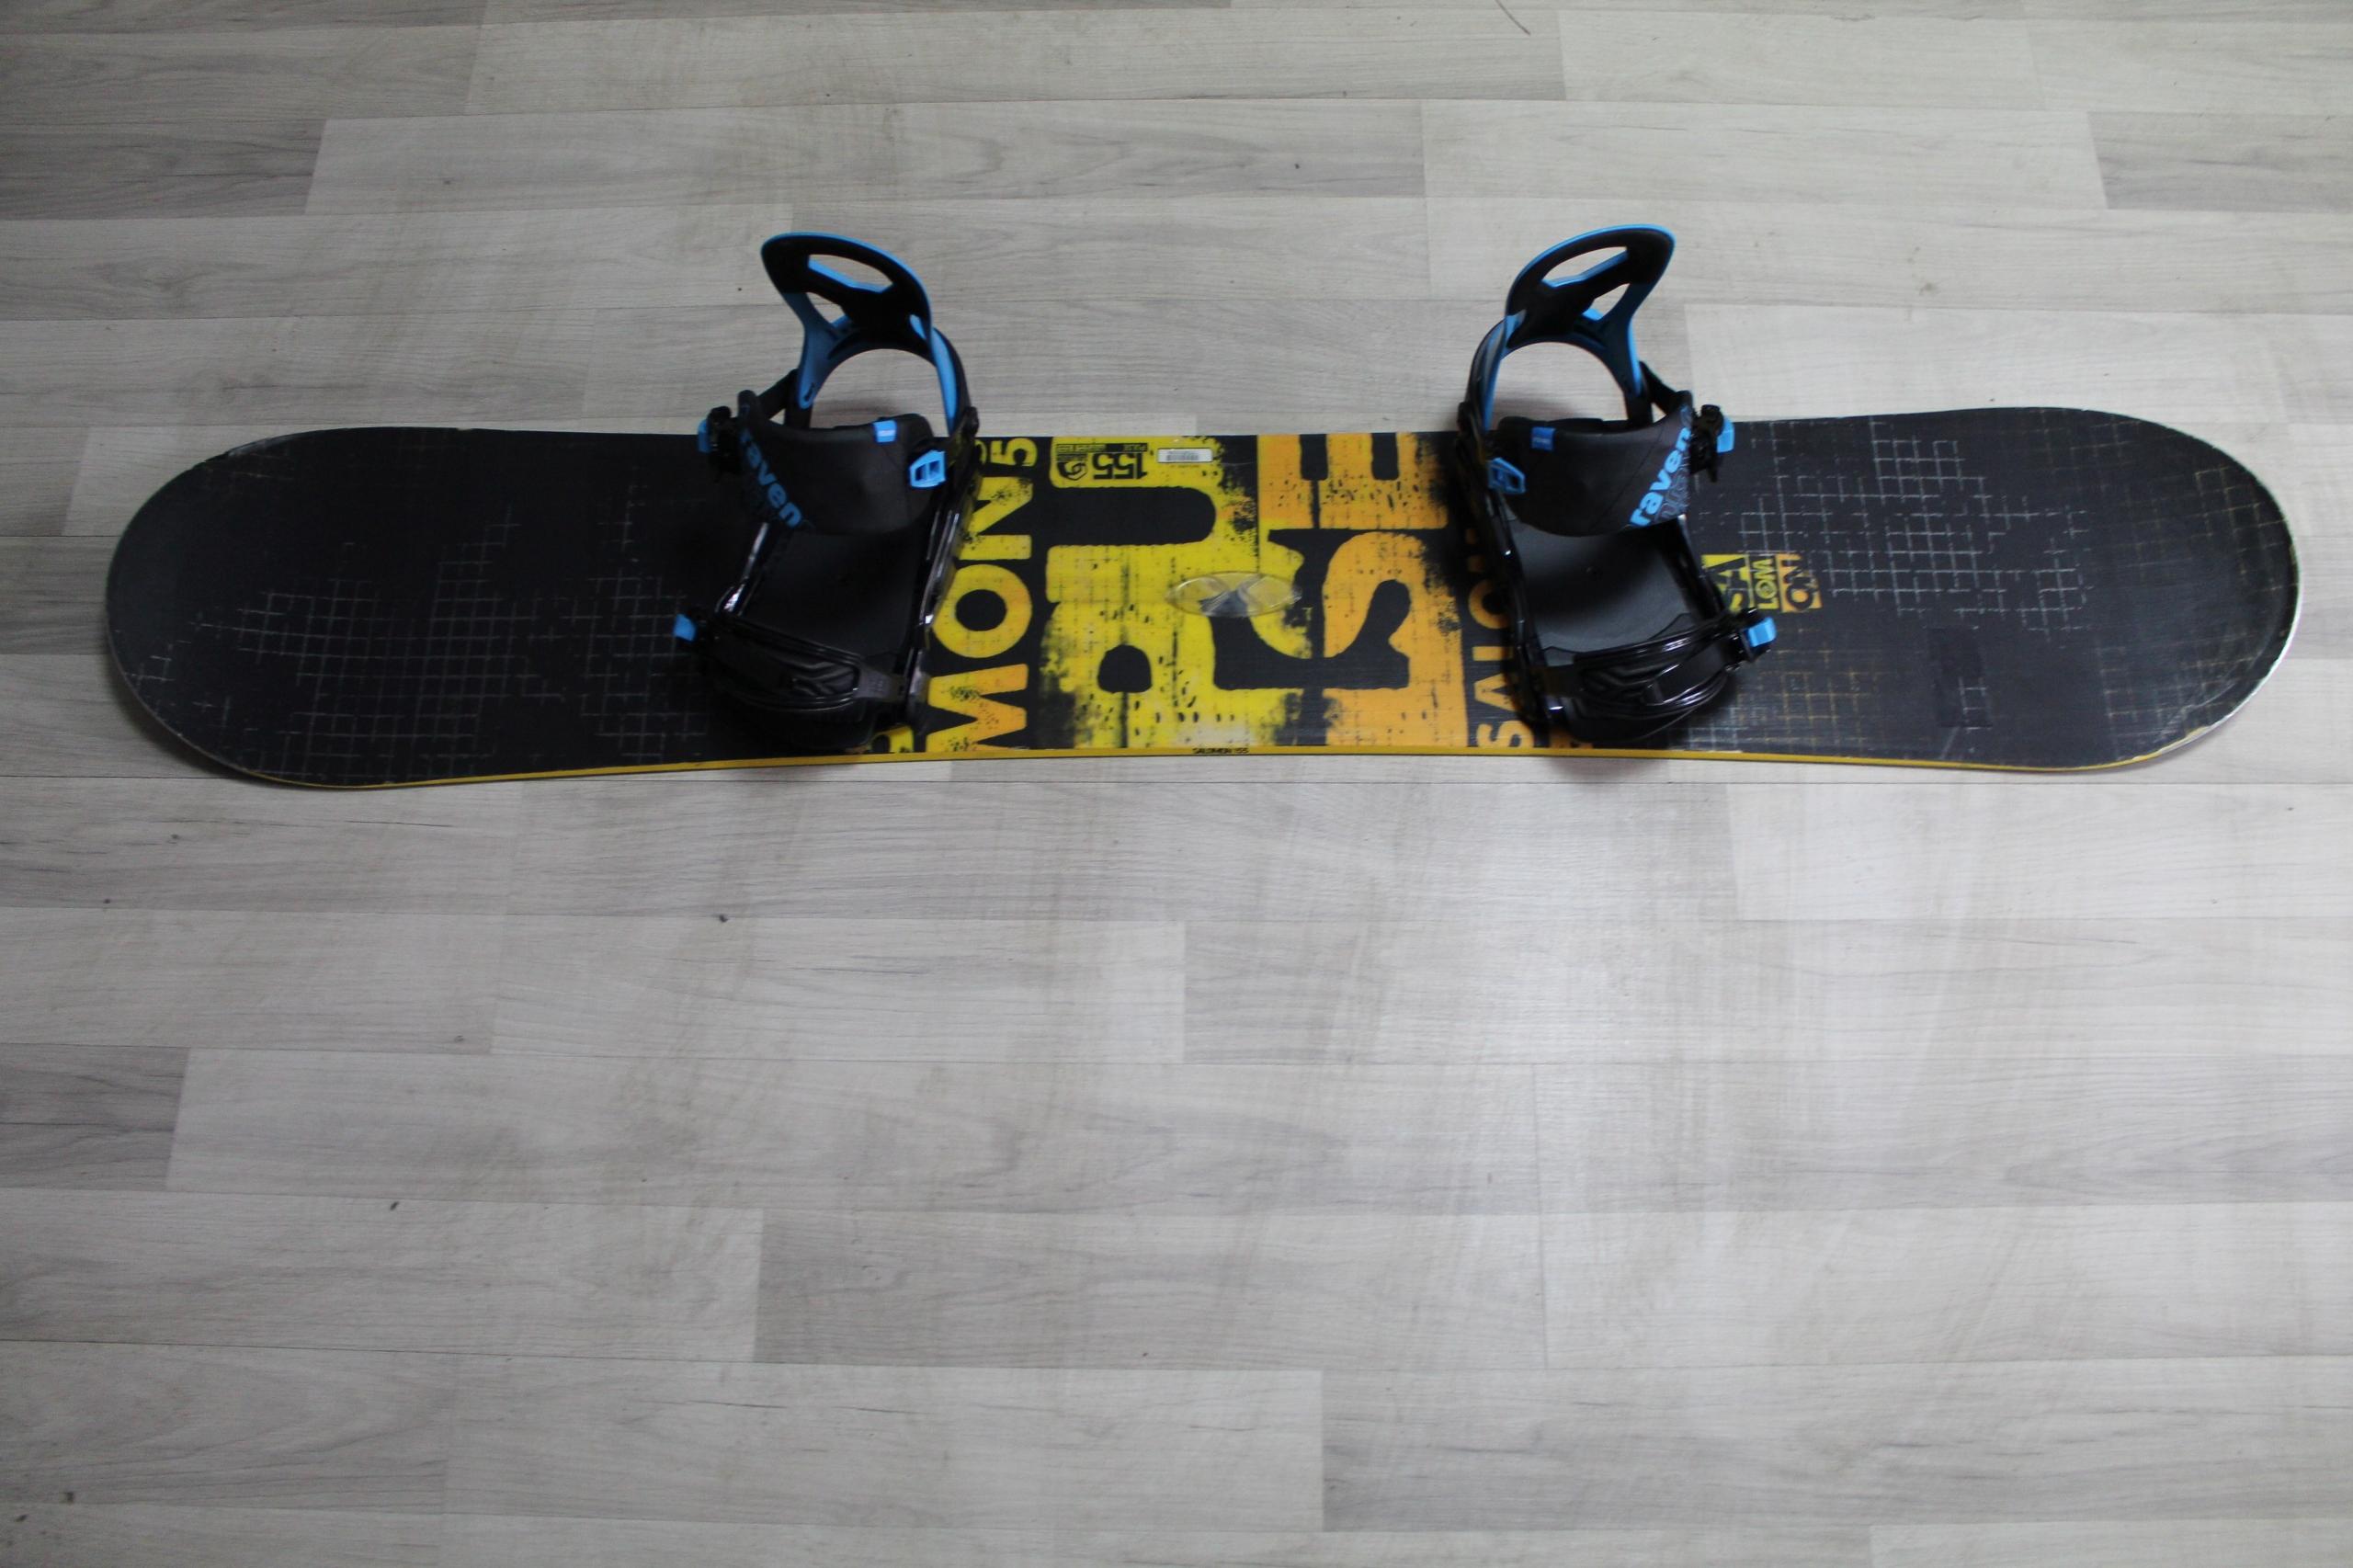 Deska Snowboard Salomon Pulse 155 Cm Wiazania No 9802385239 Allegro Pl